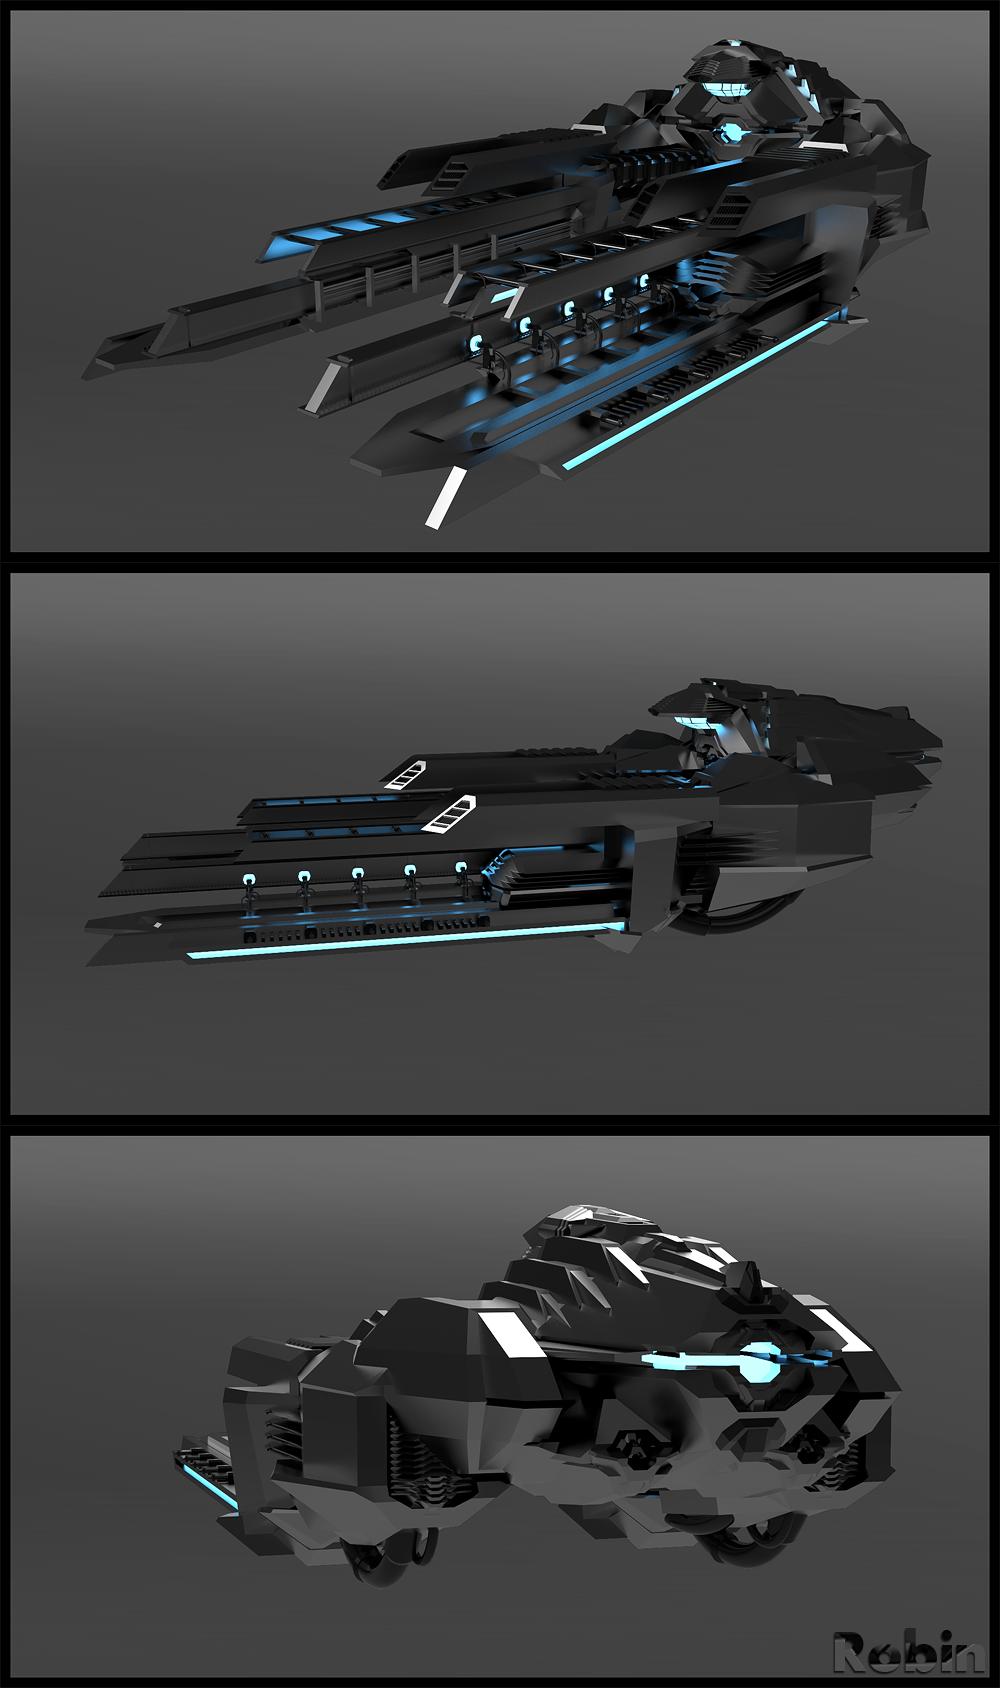 spaceship design by jasons21 - photo #6